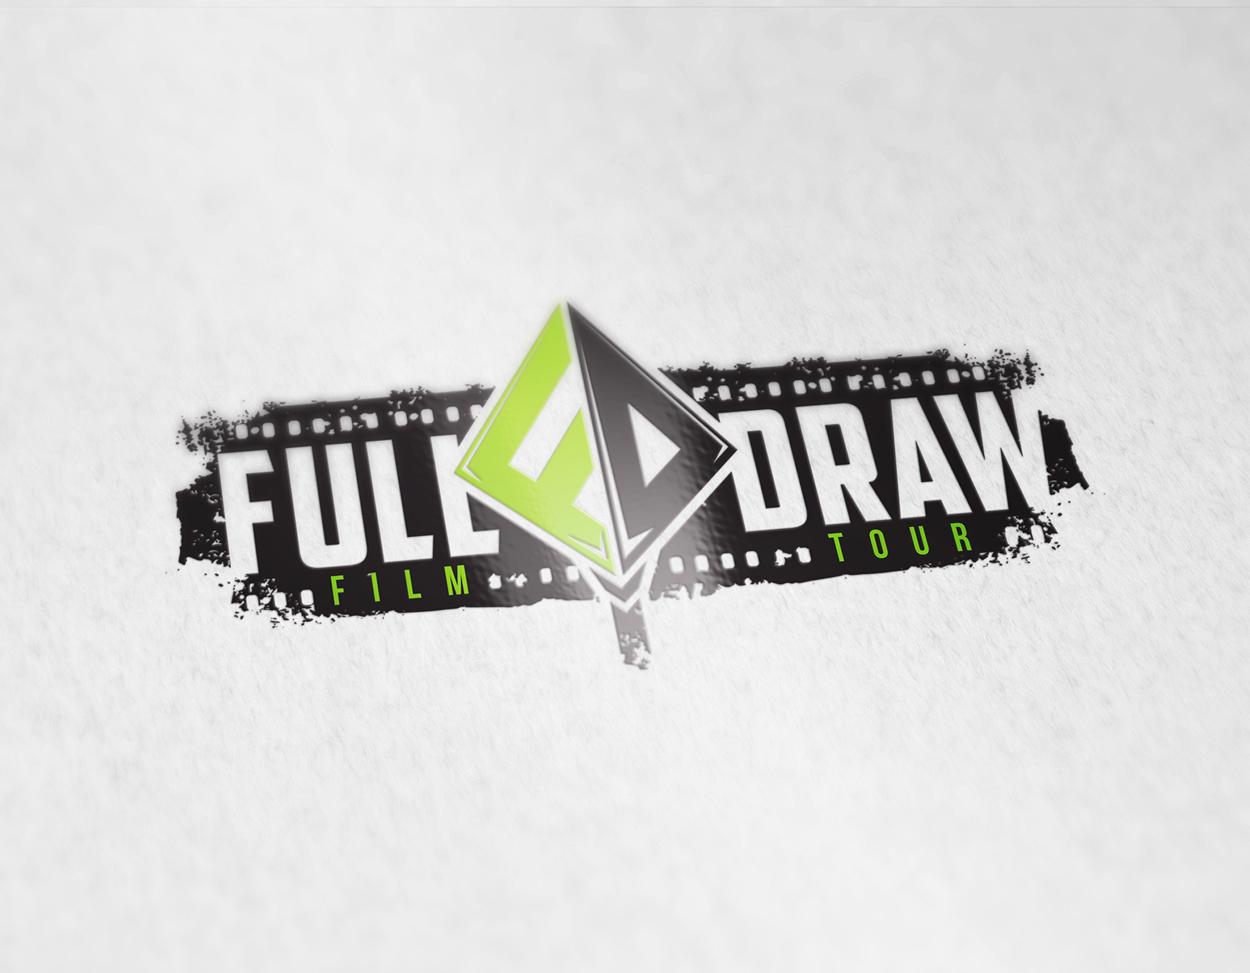 Full Draw Film Tour Bowhunting Logo Design